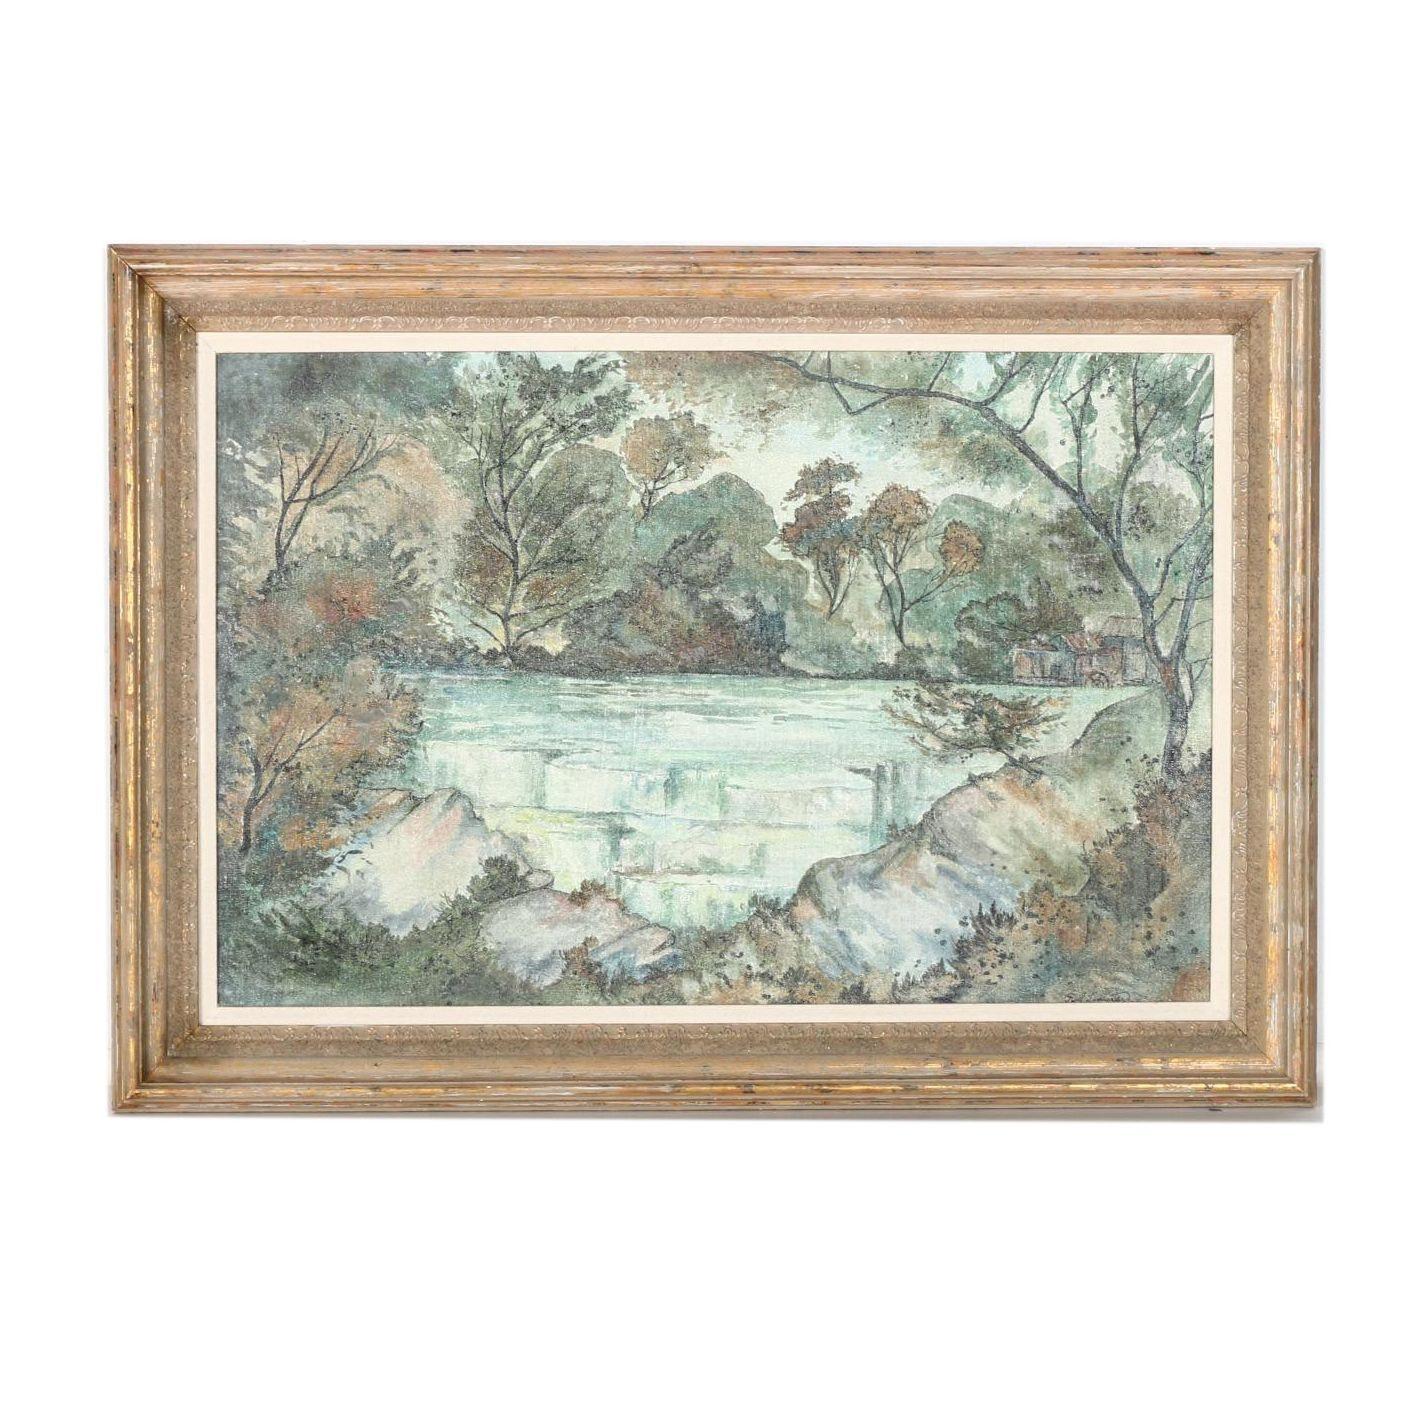 Paul Lancaster Signed Original Oil on Canvas Board of a Landscape